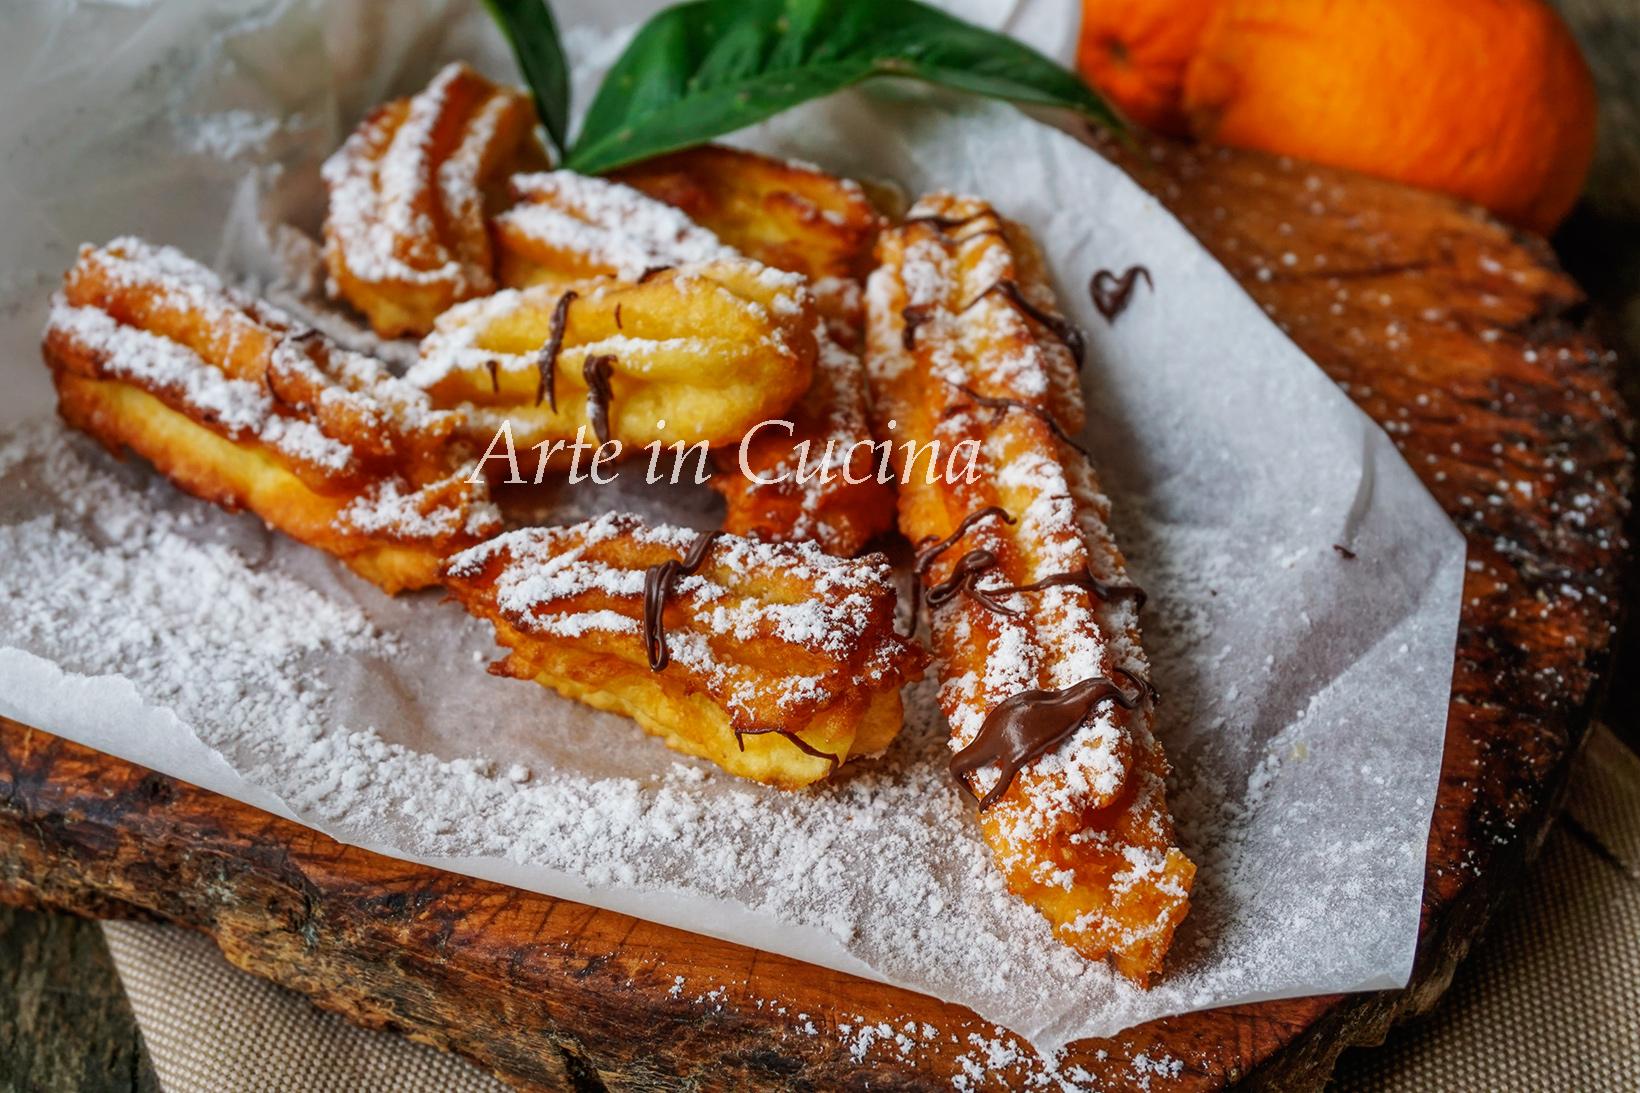 Churros all'arancia ricetta facile vickyart arte in cucina